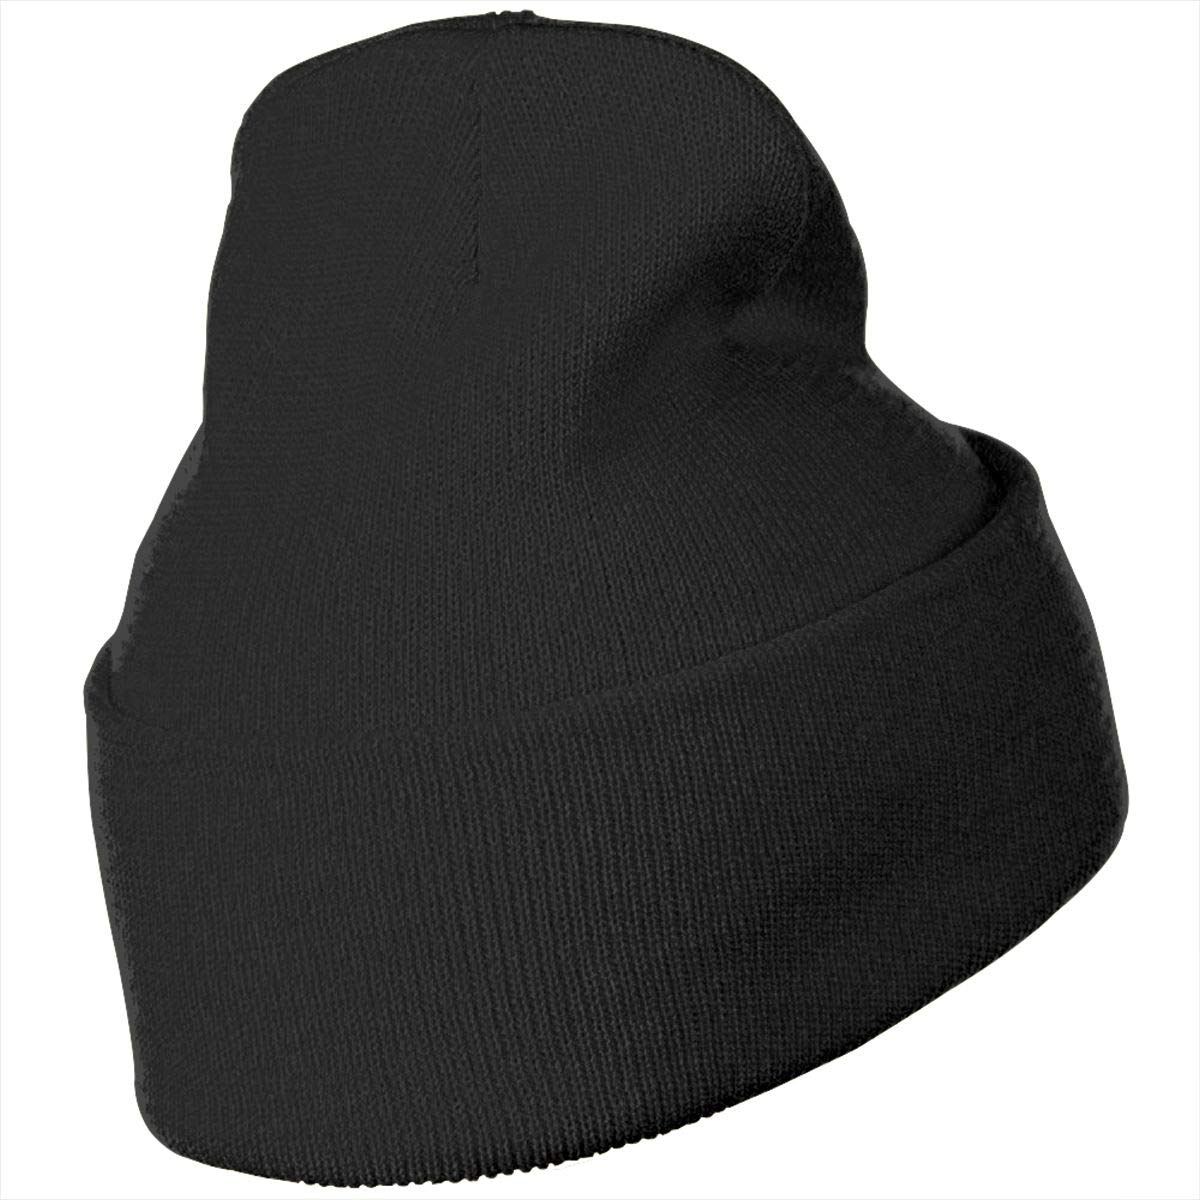 Thyroid Cancer Awareness Ribbon Men Women Knitting Hats Stretchy /& Soft Skull Cap Beanie